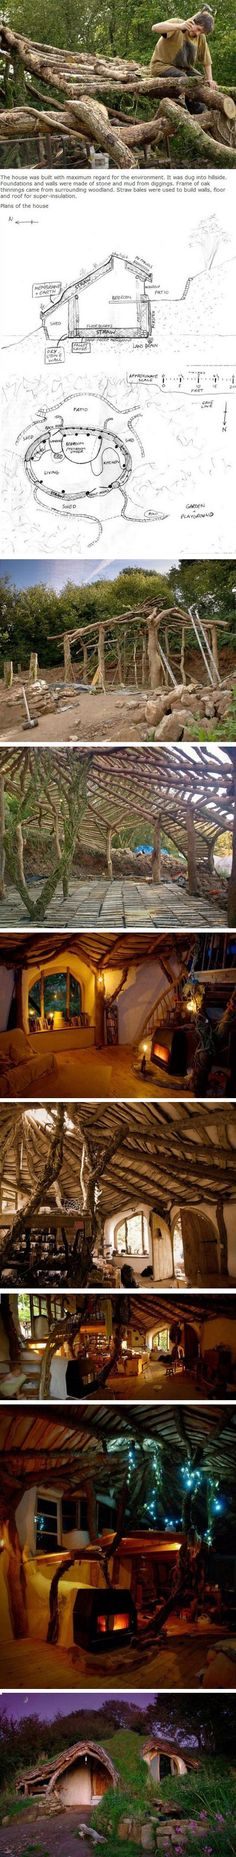 A hobbit hole! (Built for $5000!)